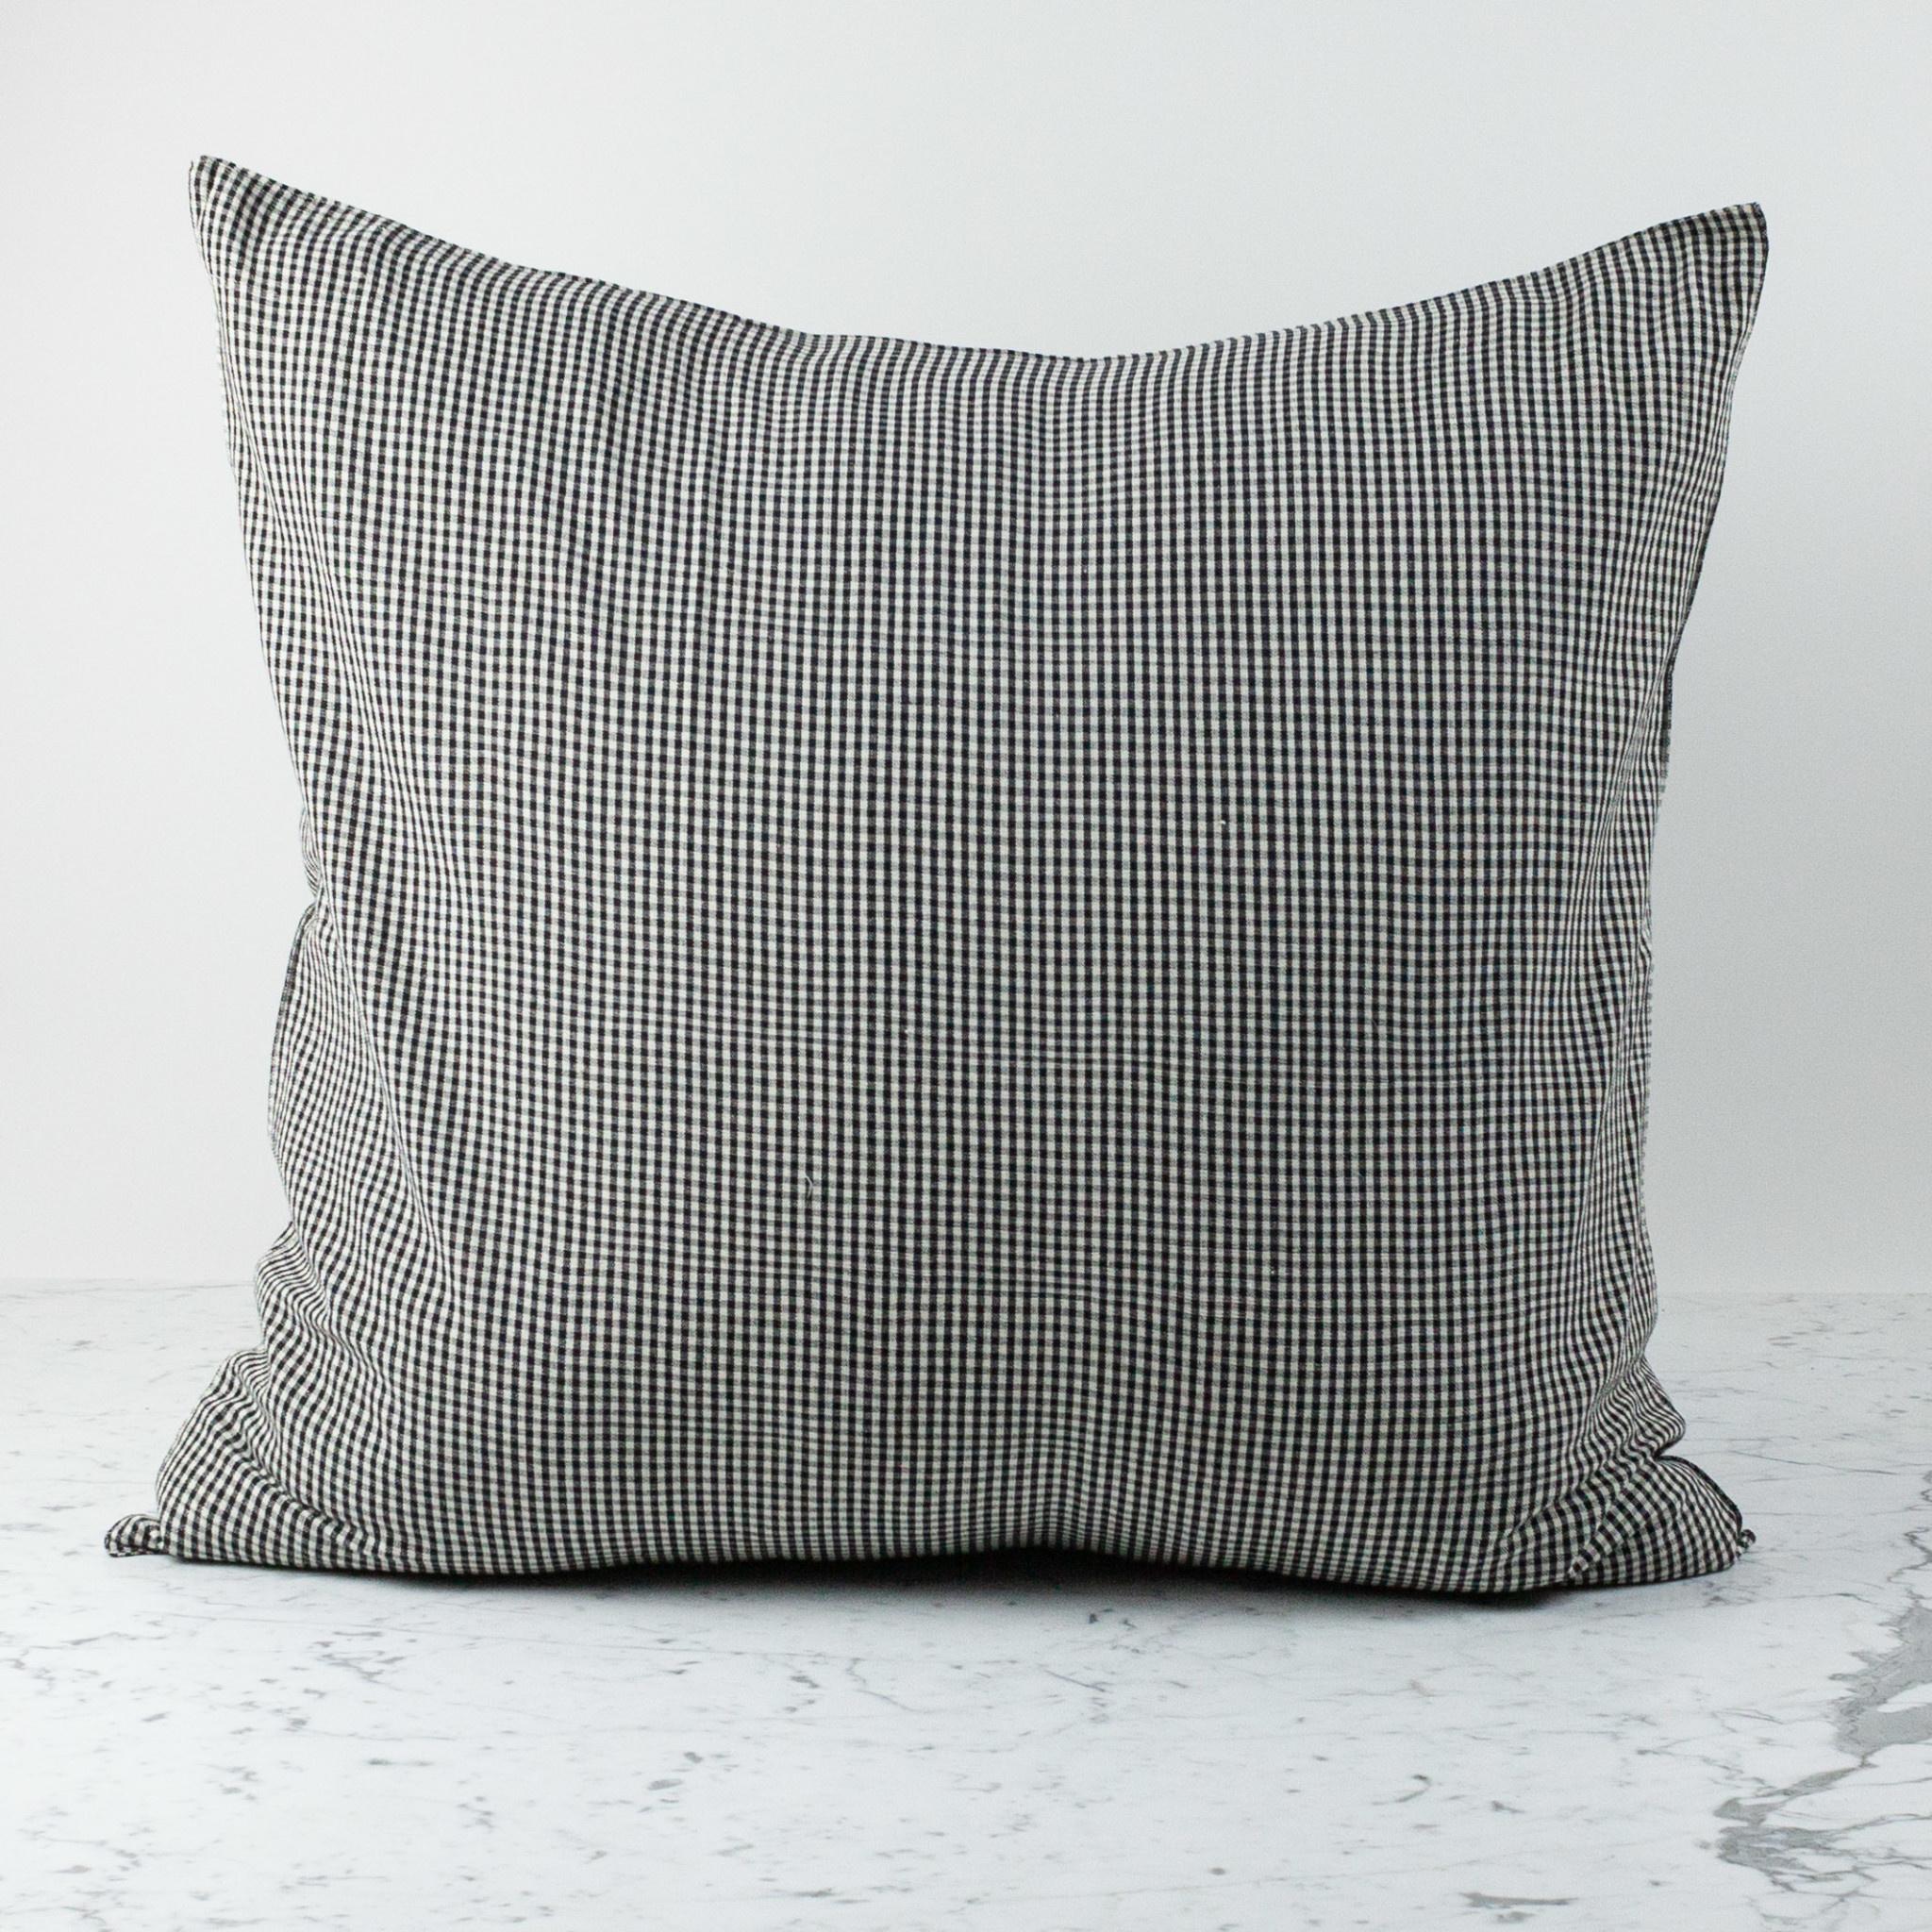 "TENSIRA 32 x 32"" - Handwoven Cotton Pillow with Down Insert - Envelope Closure - Black + White Gingham"